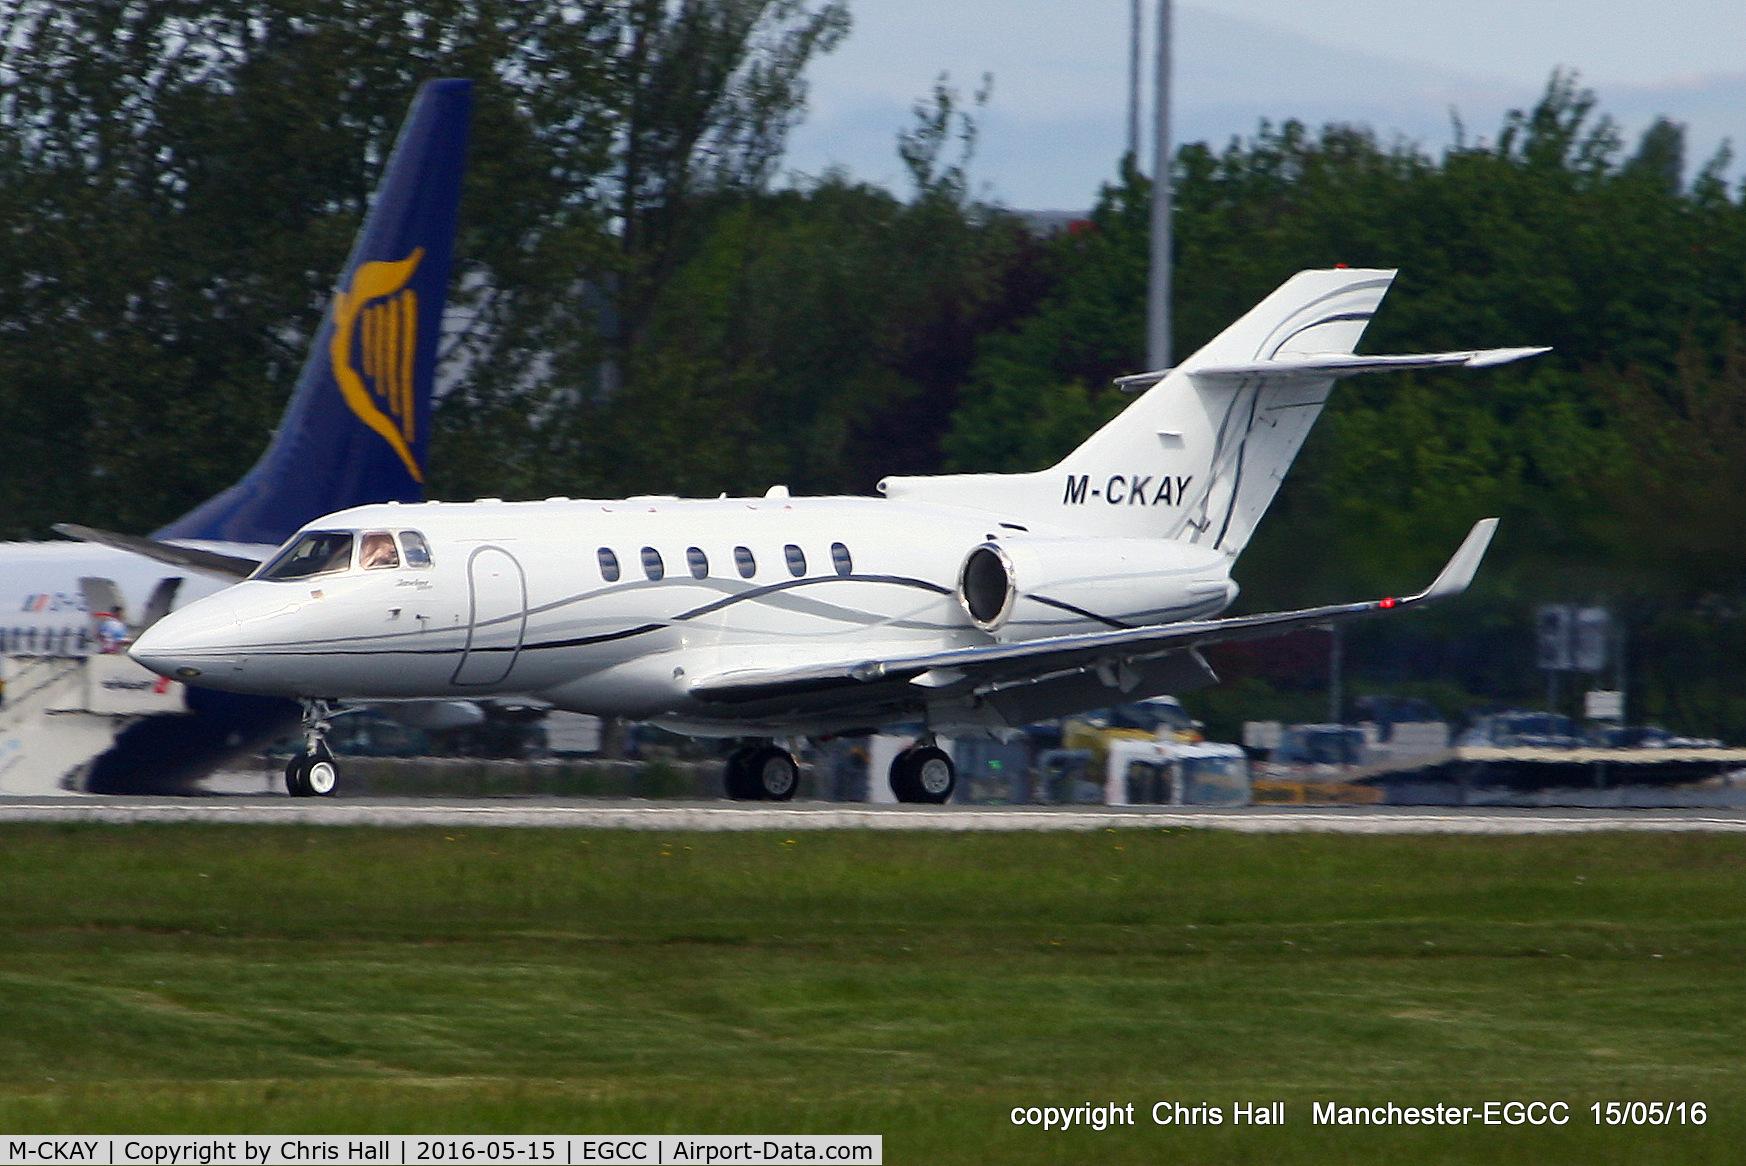 M-CKAY, 2009 Hawker Beechcraft 900XP C/N HA-0140, Sunseeker Corporate Aviation Ltd